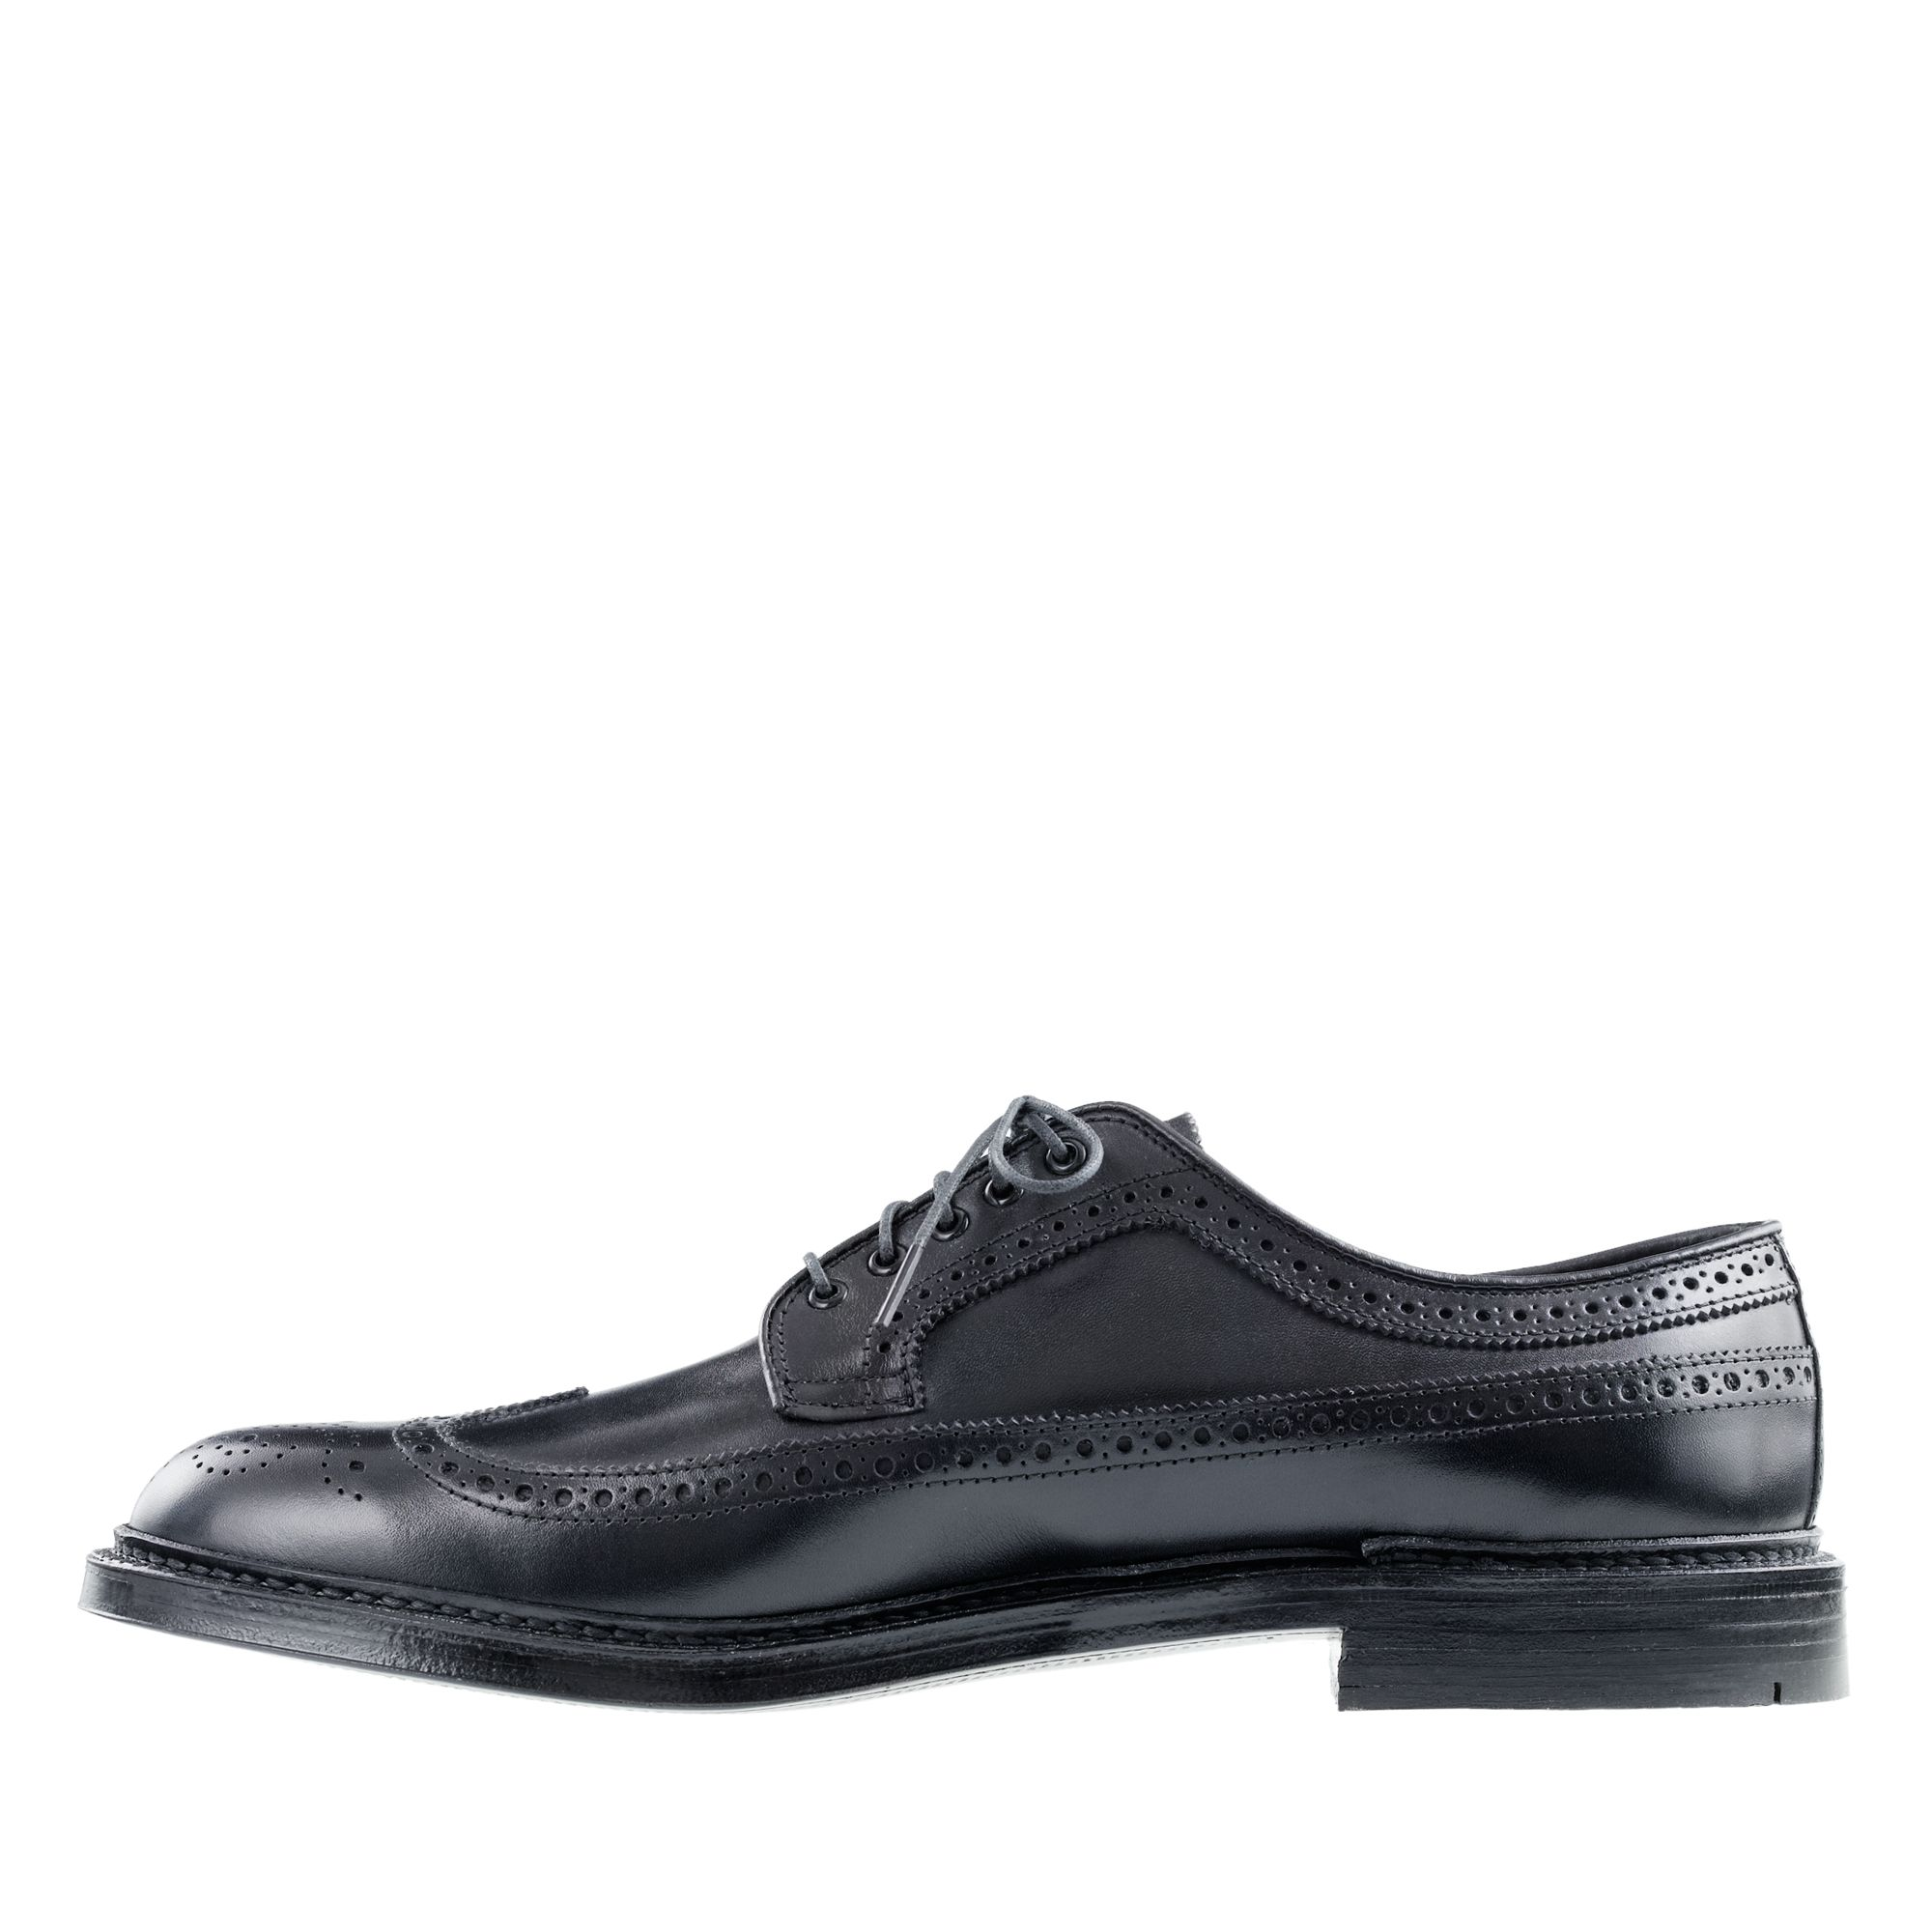 J.Crew Leather Alden Longwing Bluchers in Black (Brown) for Men